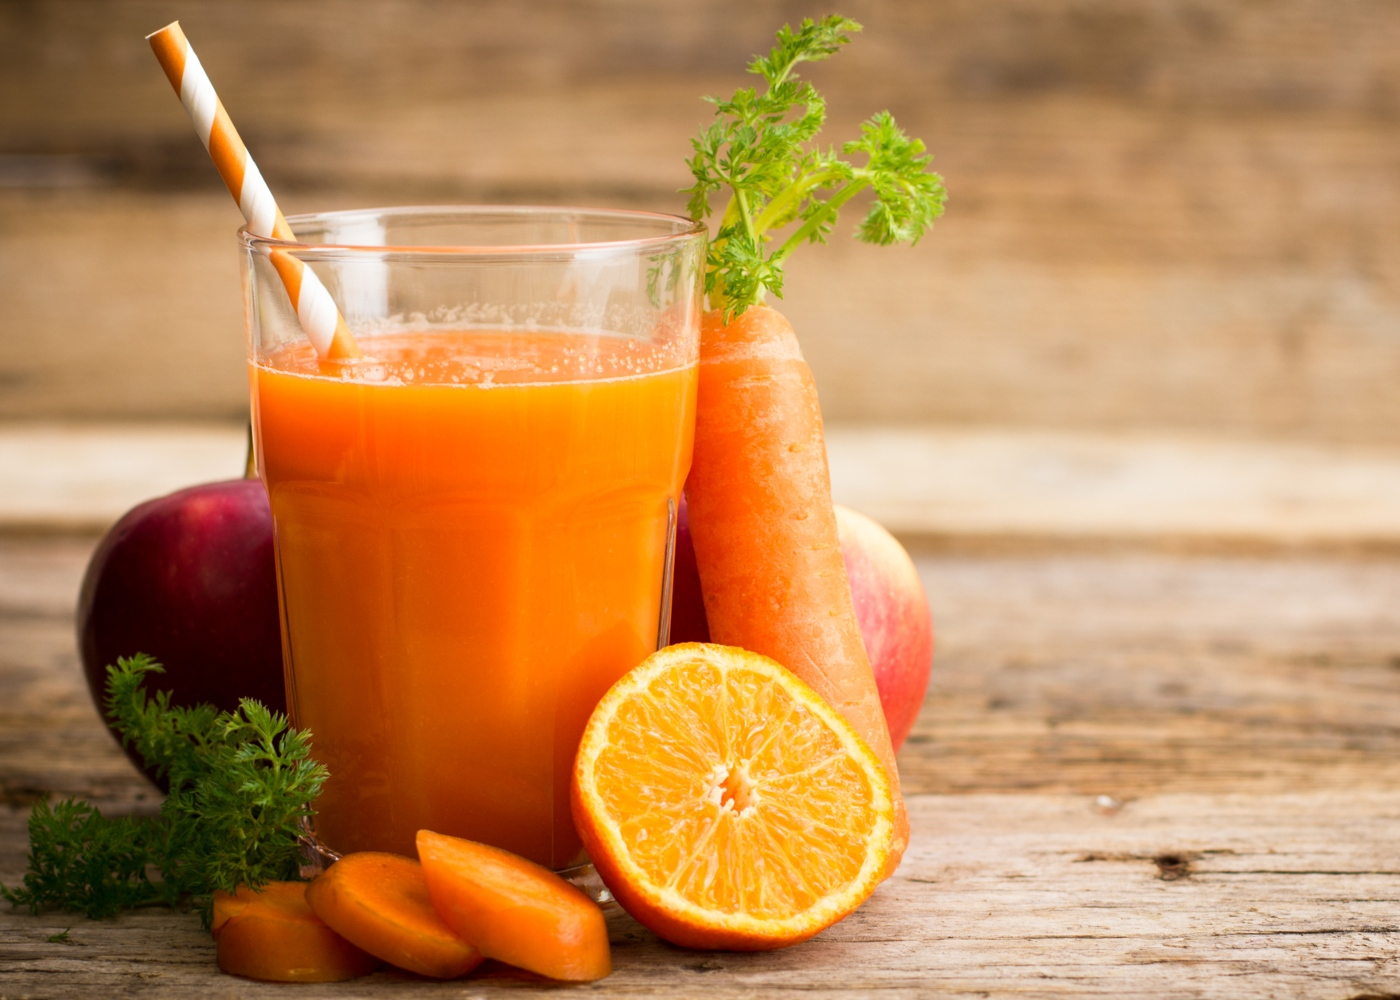 Batido saudáveis: de cenoura, laranja, maçã